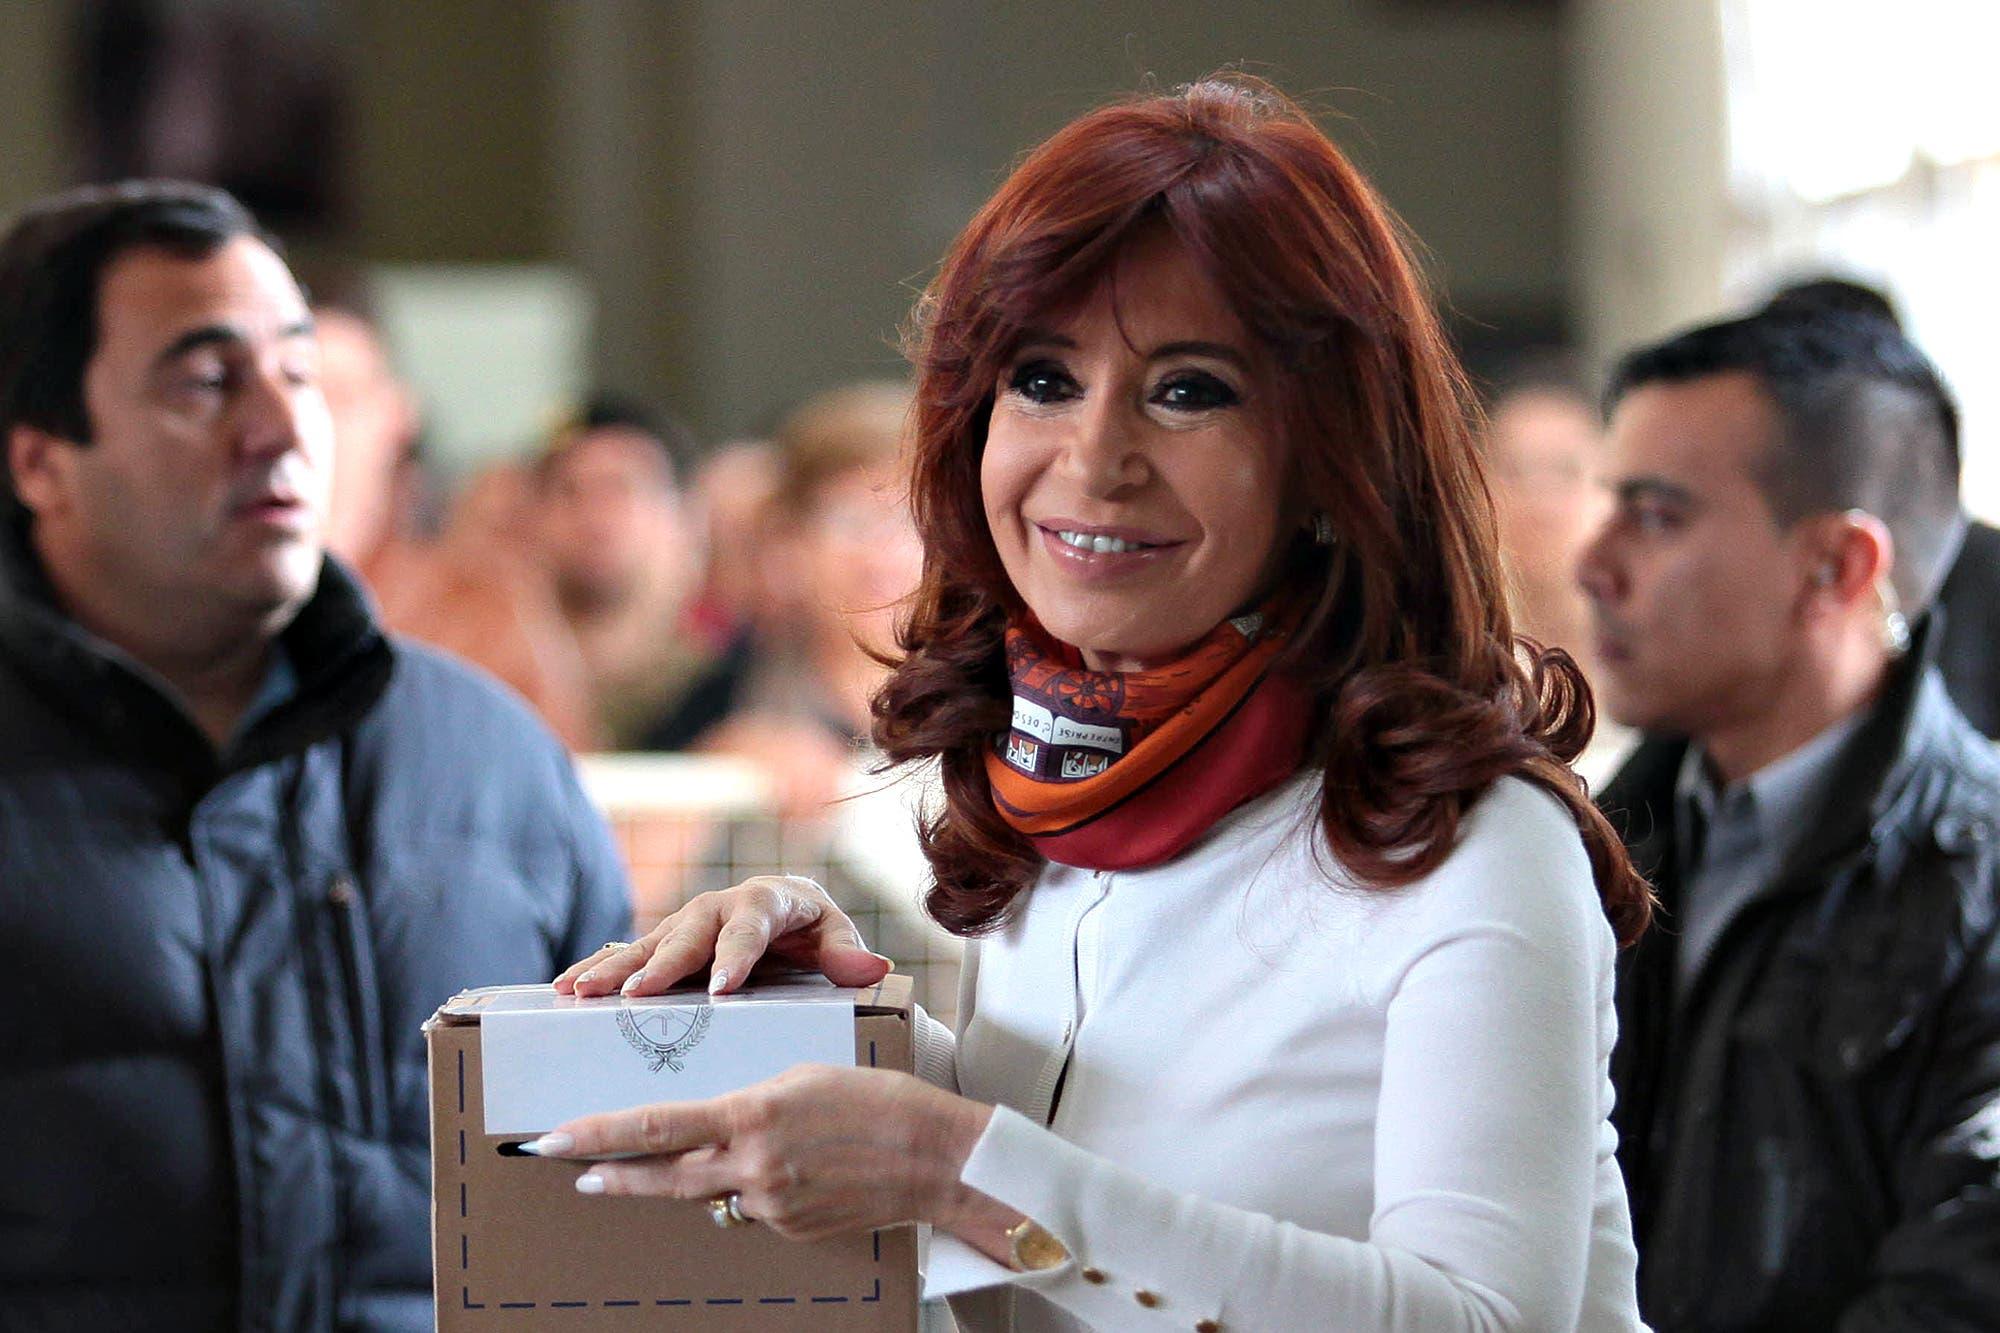 Por WhastApp, Cristina Kirchner hizo un pedido especial a los fiscales del Frente de Todos